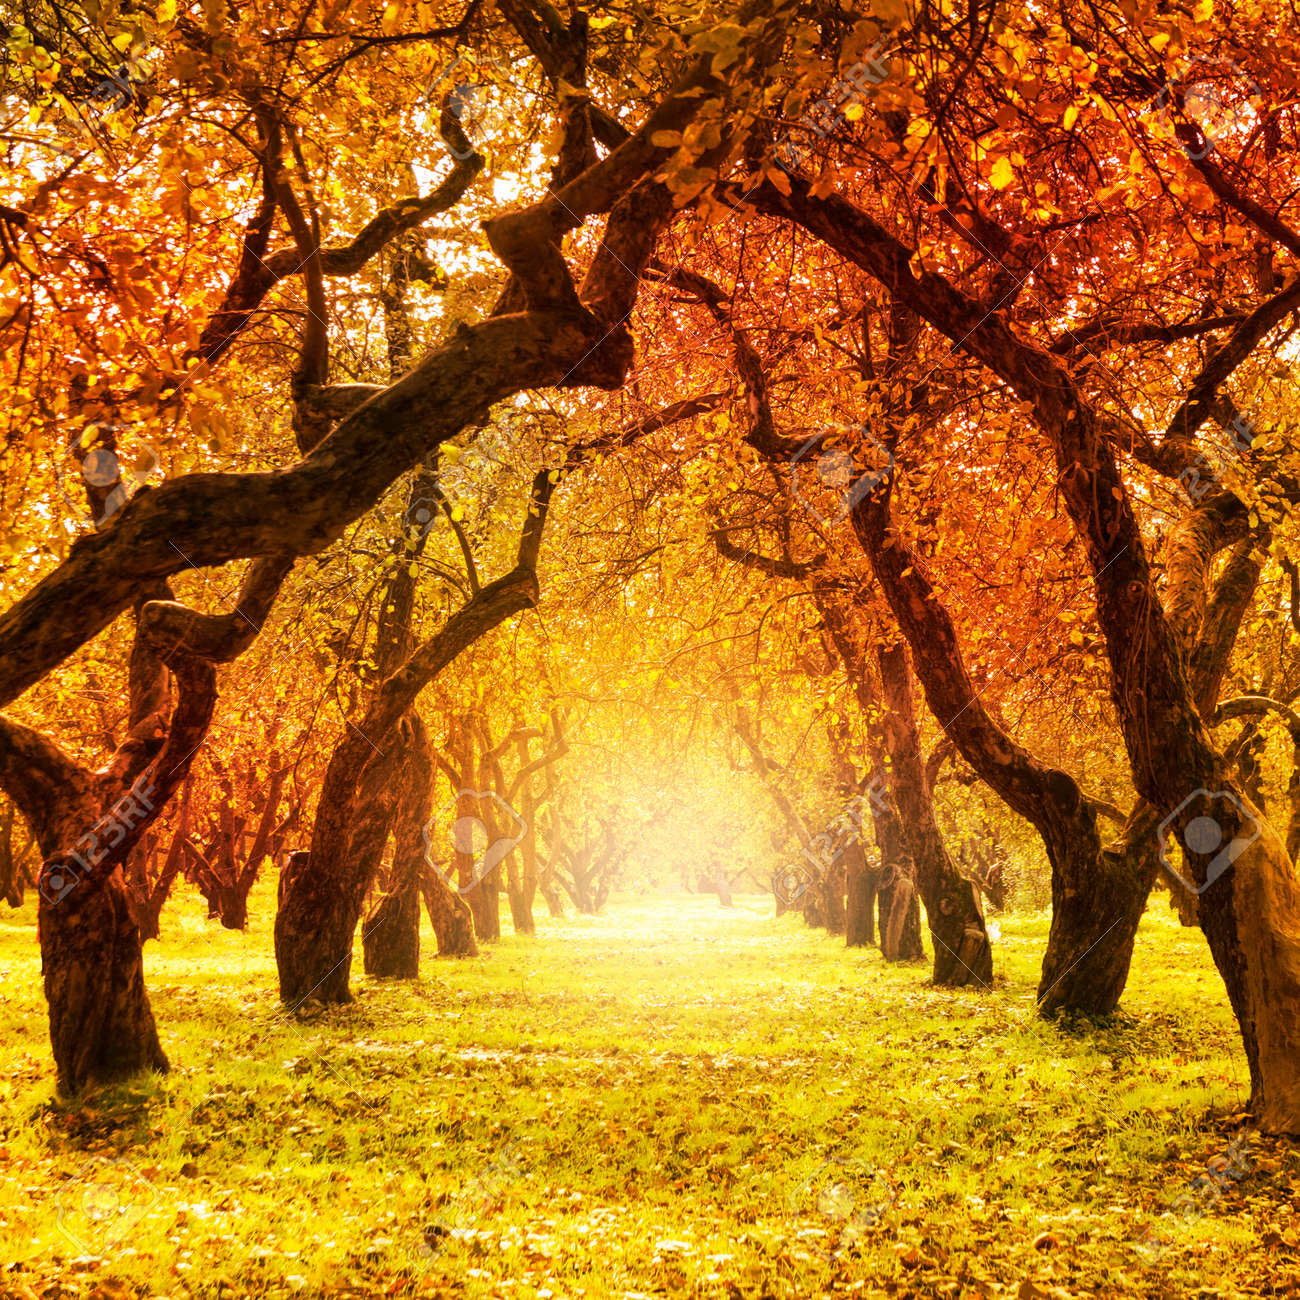 Autumn Fall Autumnal Park Autumn Trees And Leaves Stock Photo